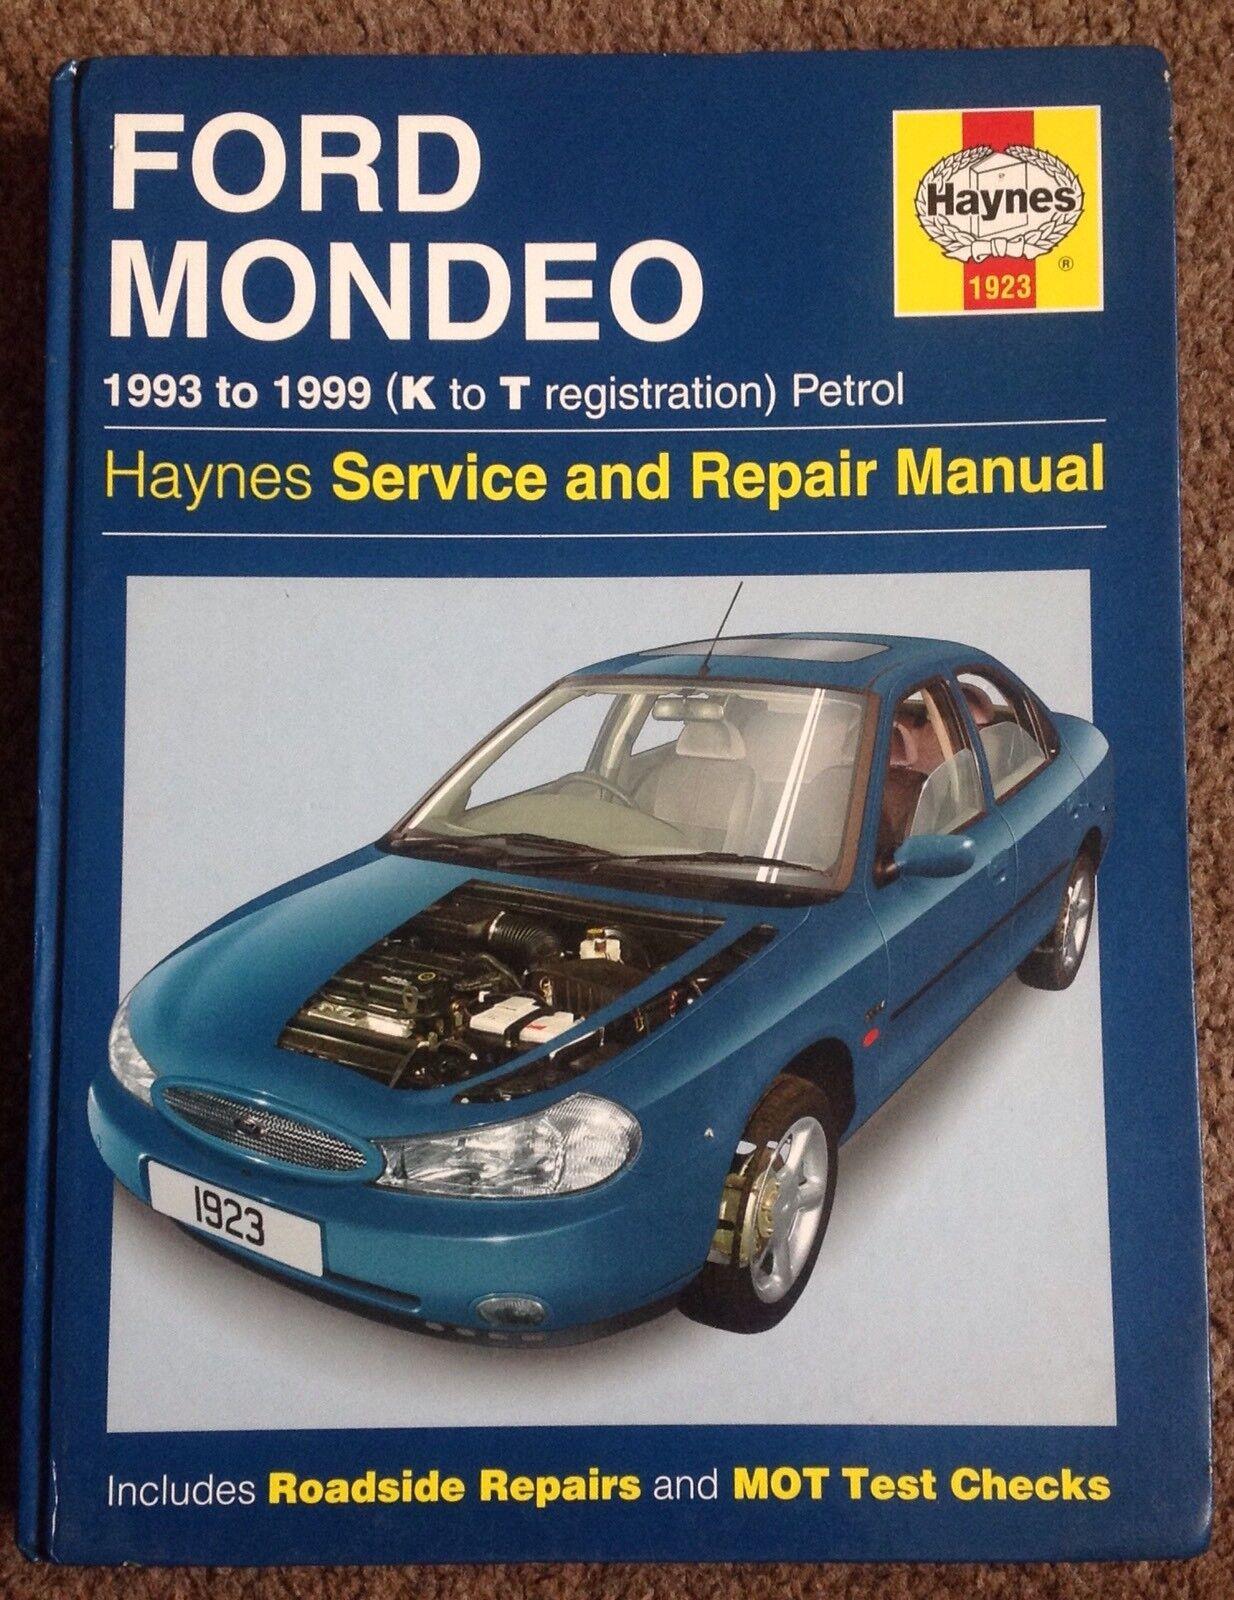 Haynes Ford MONDEO 1993 to Sept 2000 Petrol Service and Repair Manual | eBay